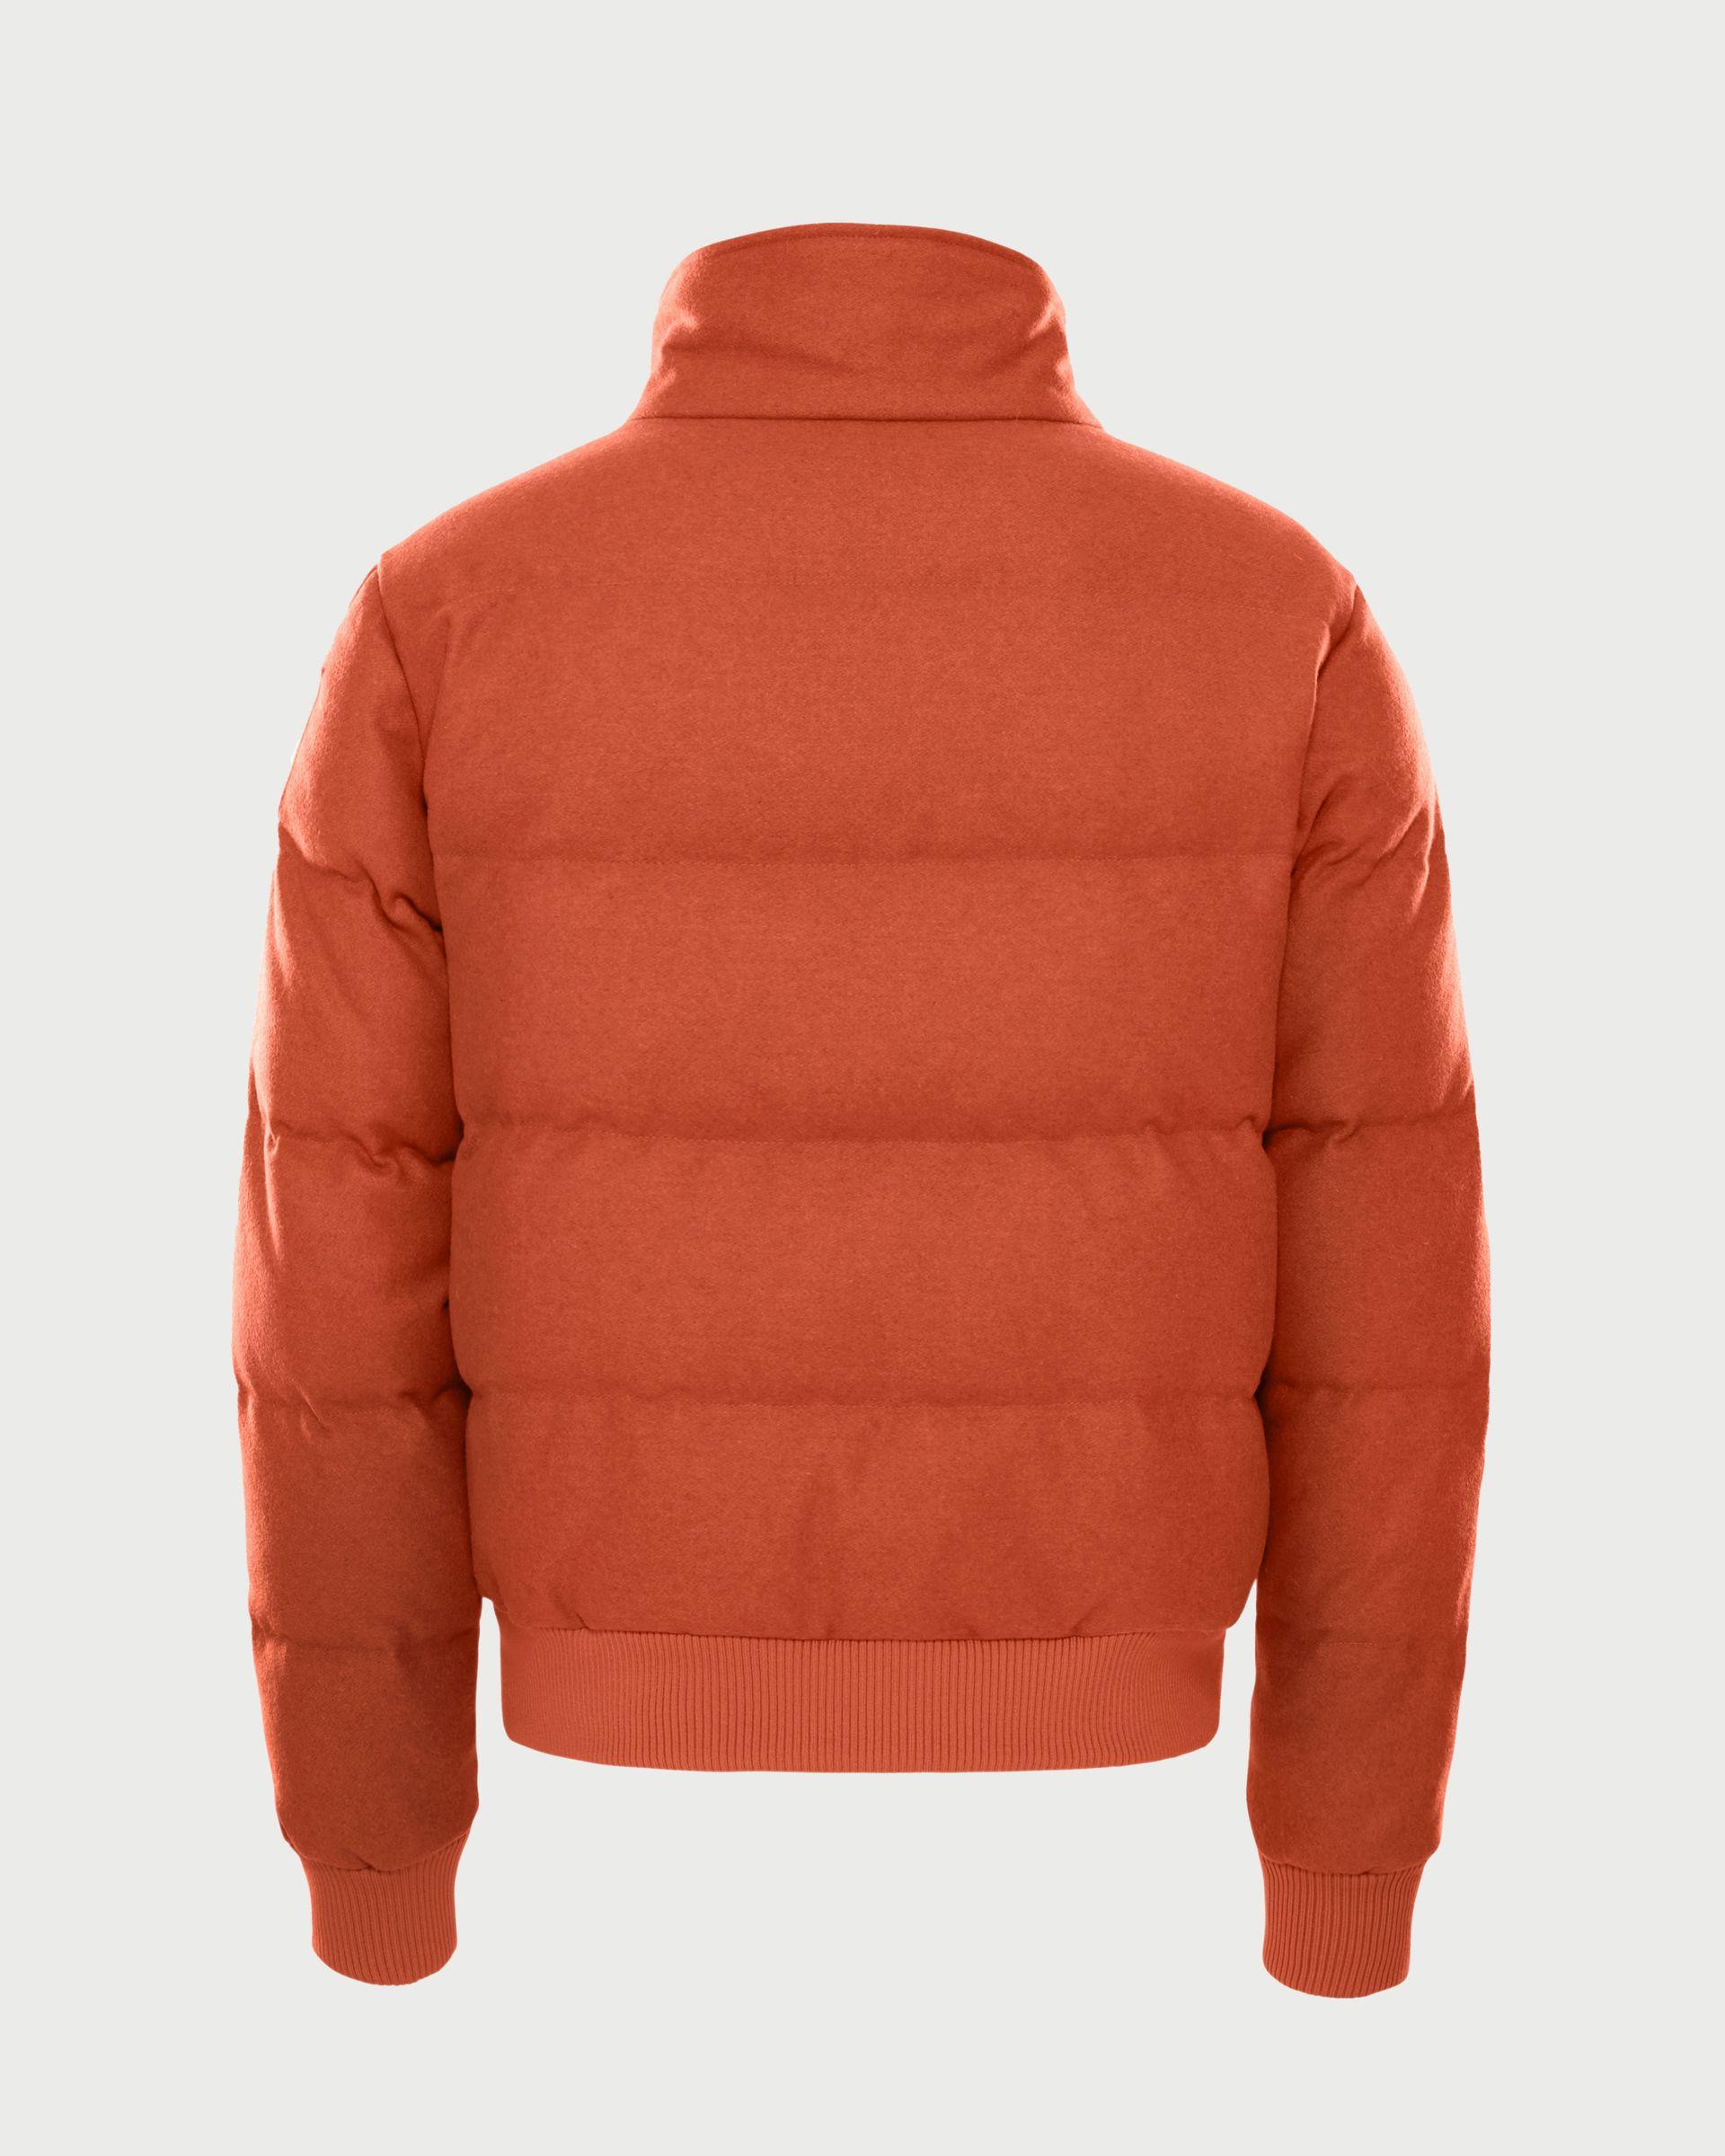 The North Face Brown Label - Larkspur Wool Down Jacket Heritage Orange Men - Image 2